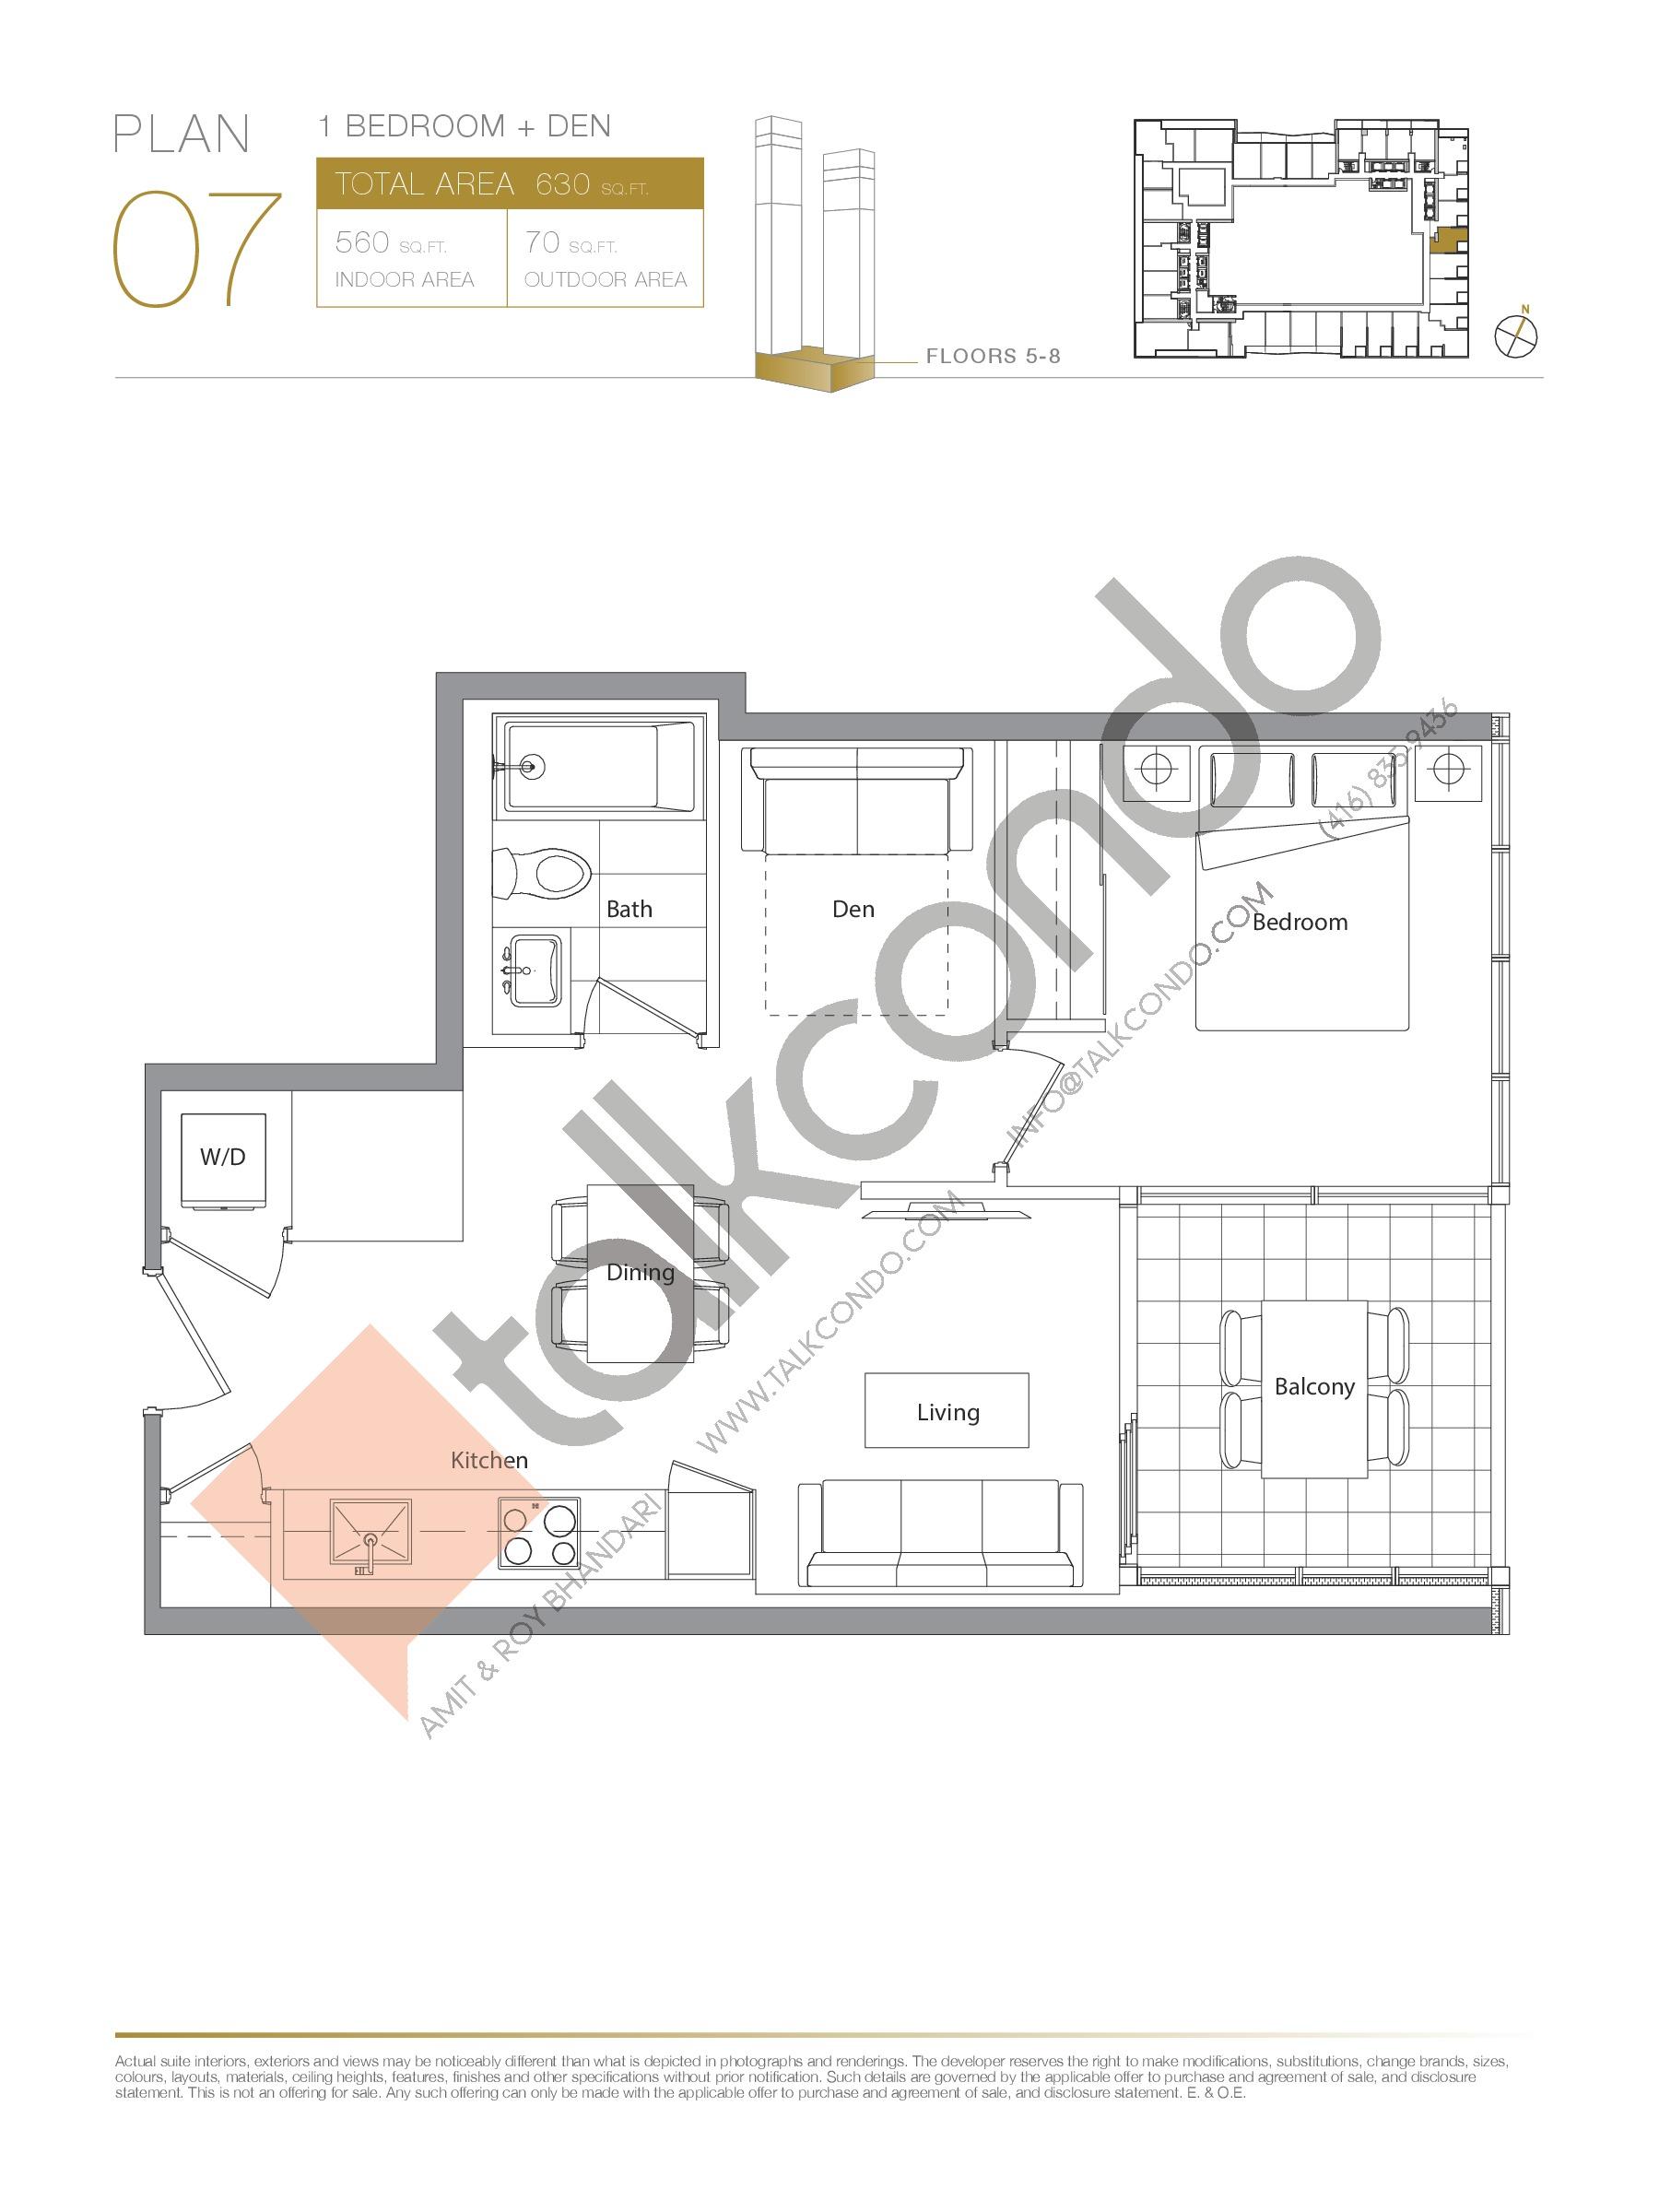 Plan 07 - Podium Floor Plan at Concord Canada House Condos - 560 sq.ft